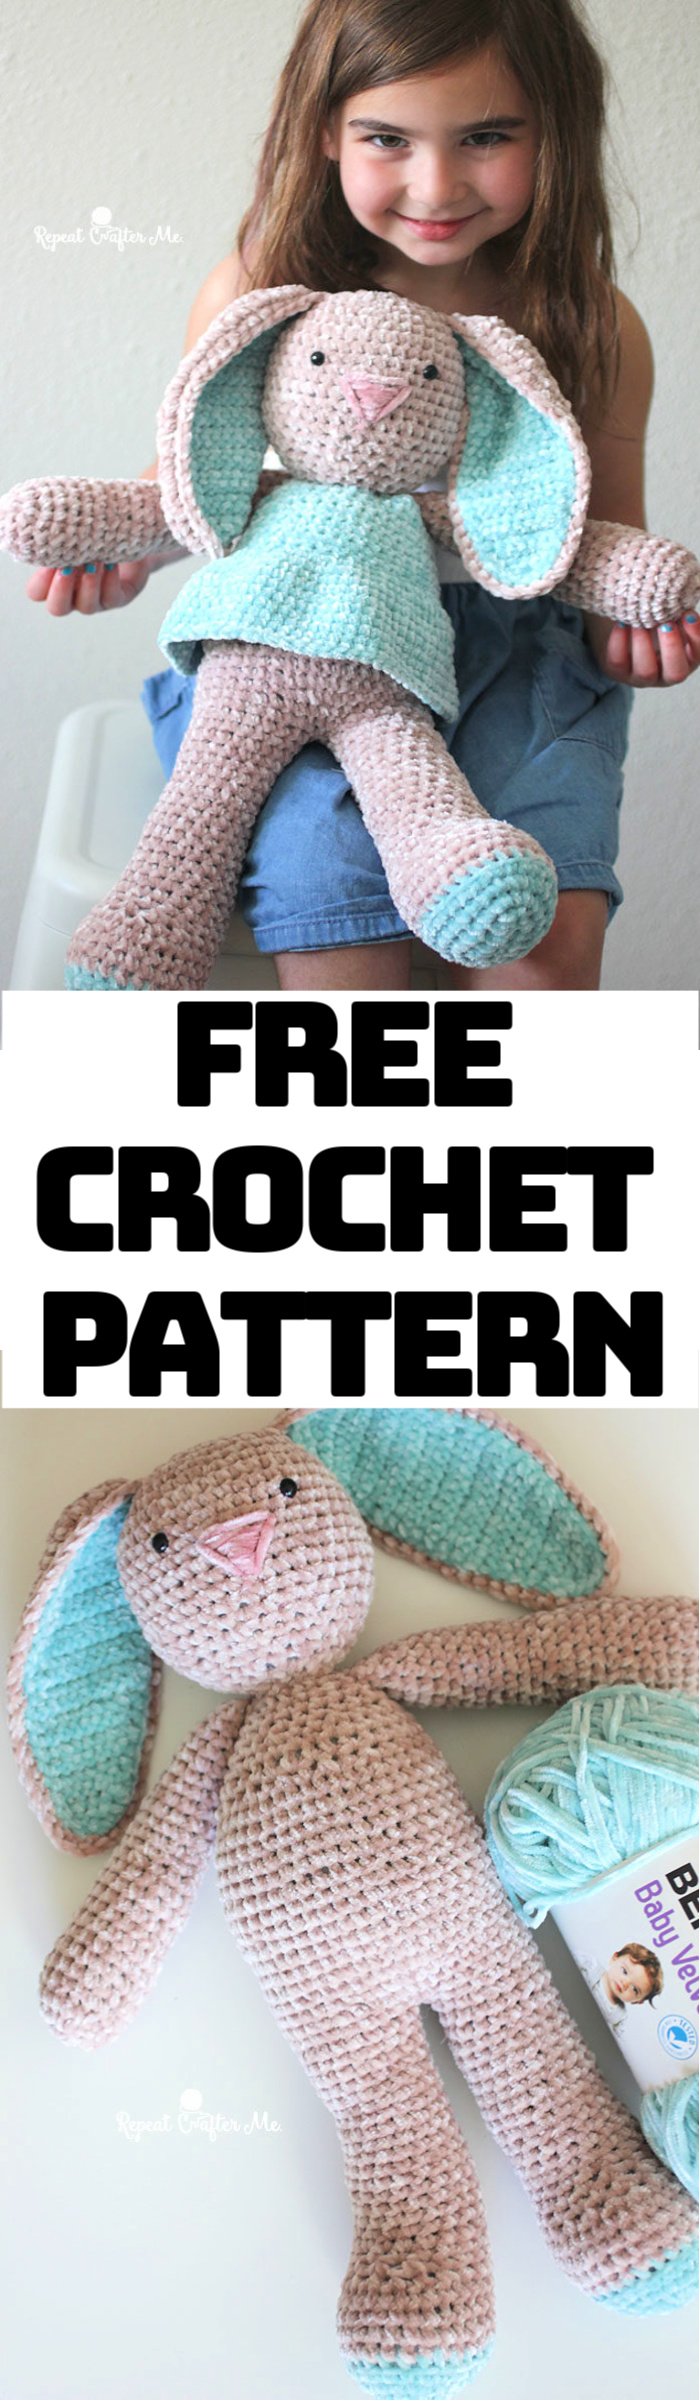 Velvet Bunny Amigurumi Free Crochet Pattern | Crochet bunny ... | 2400x700